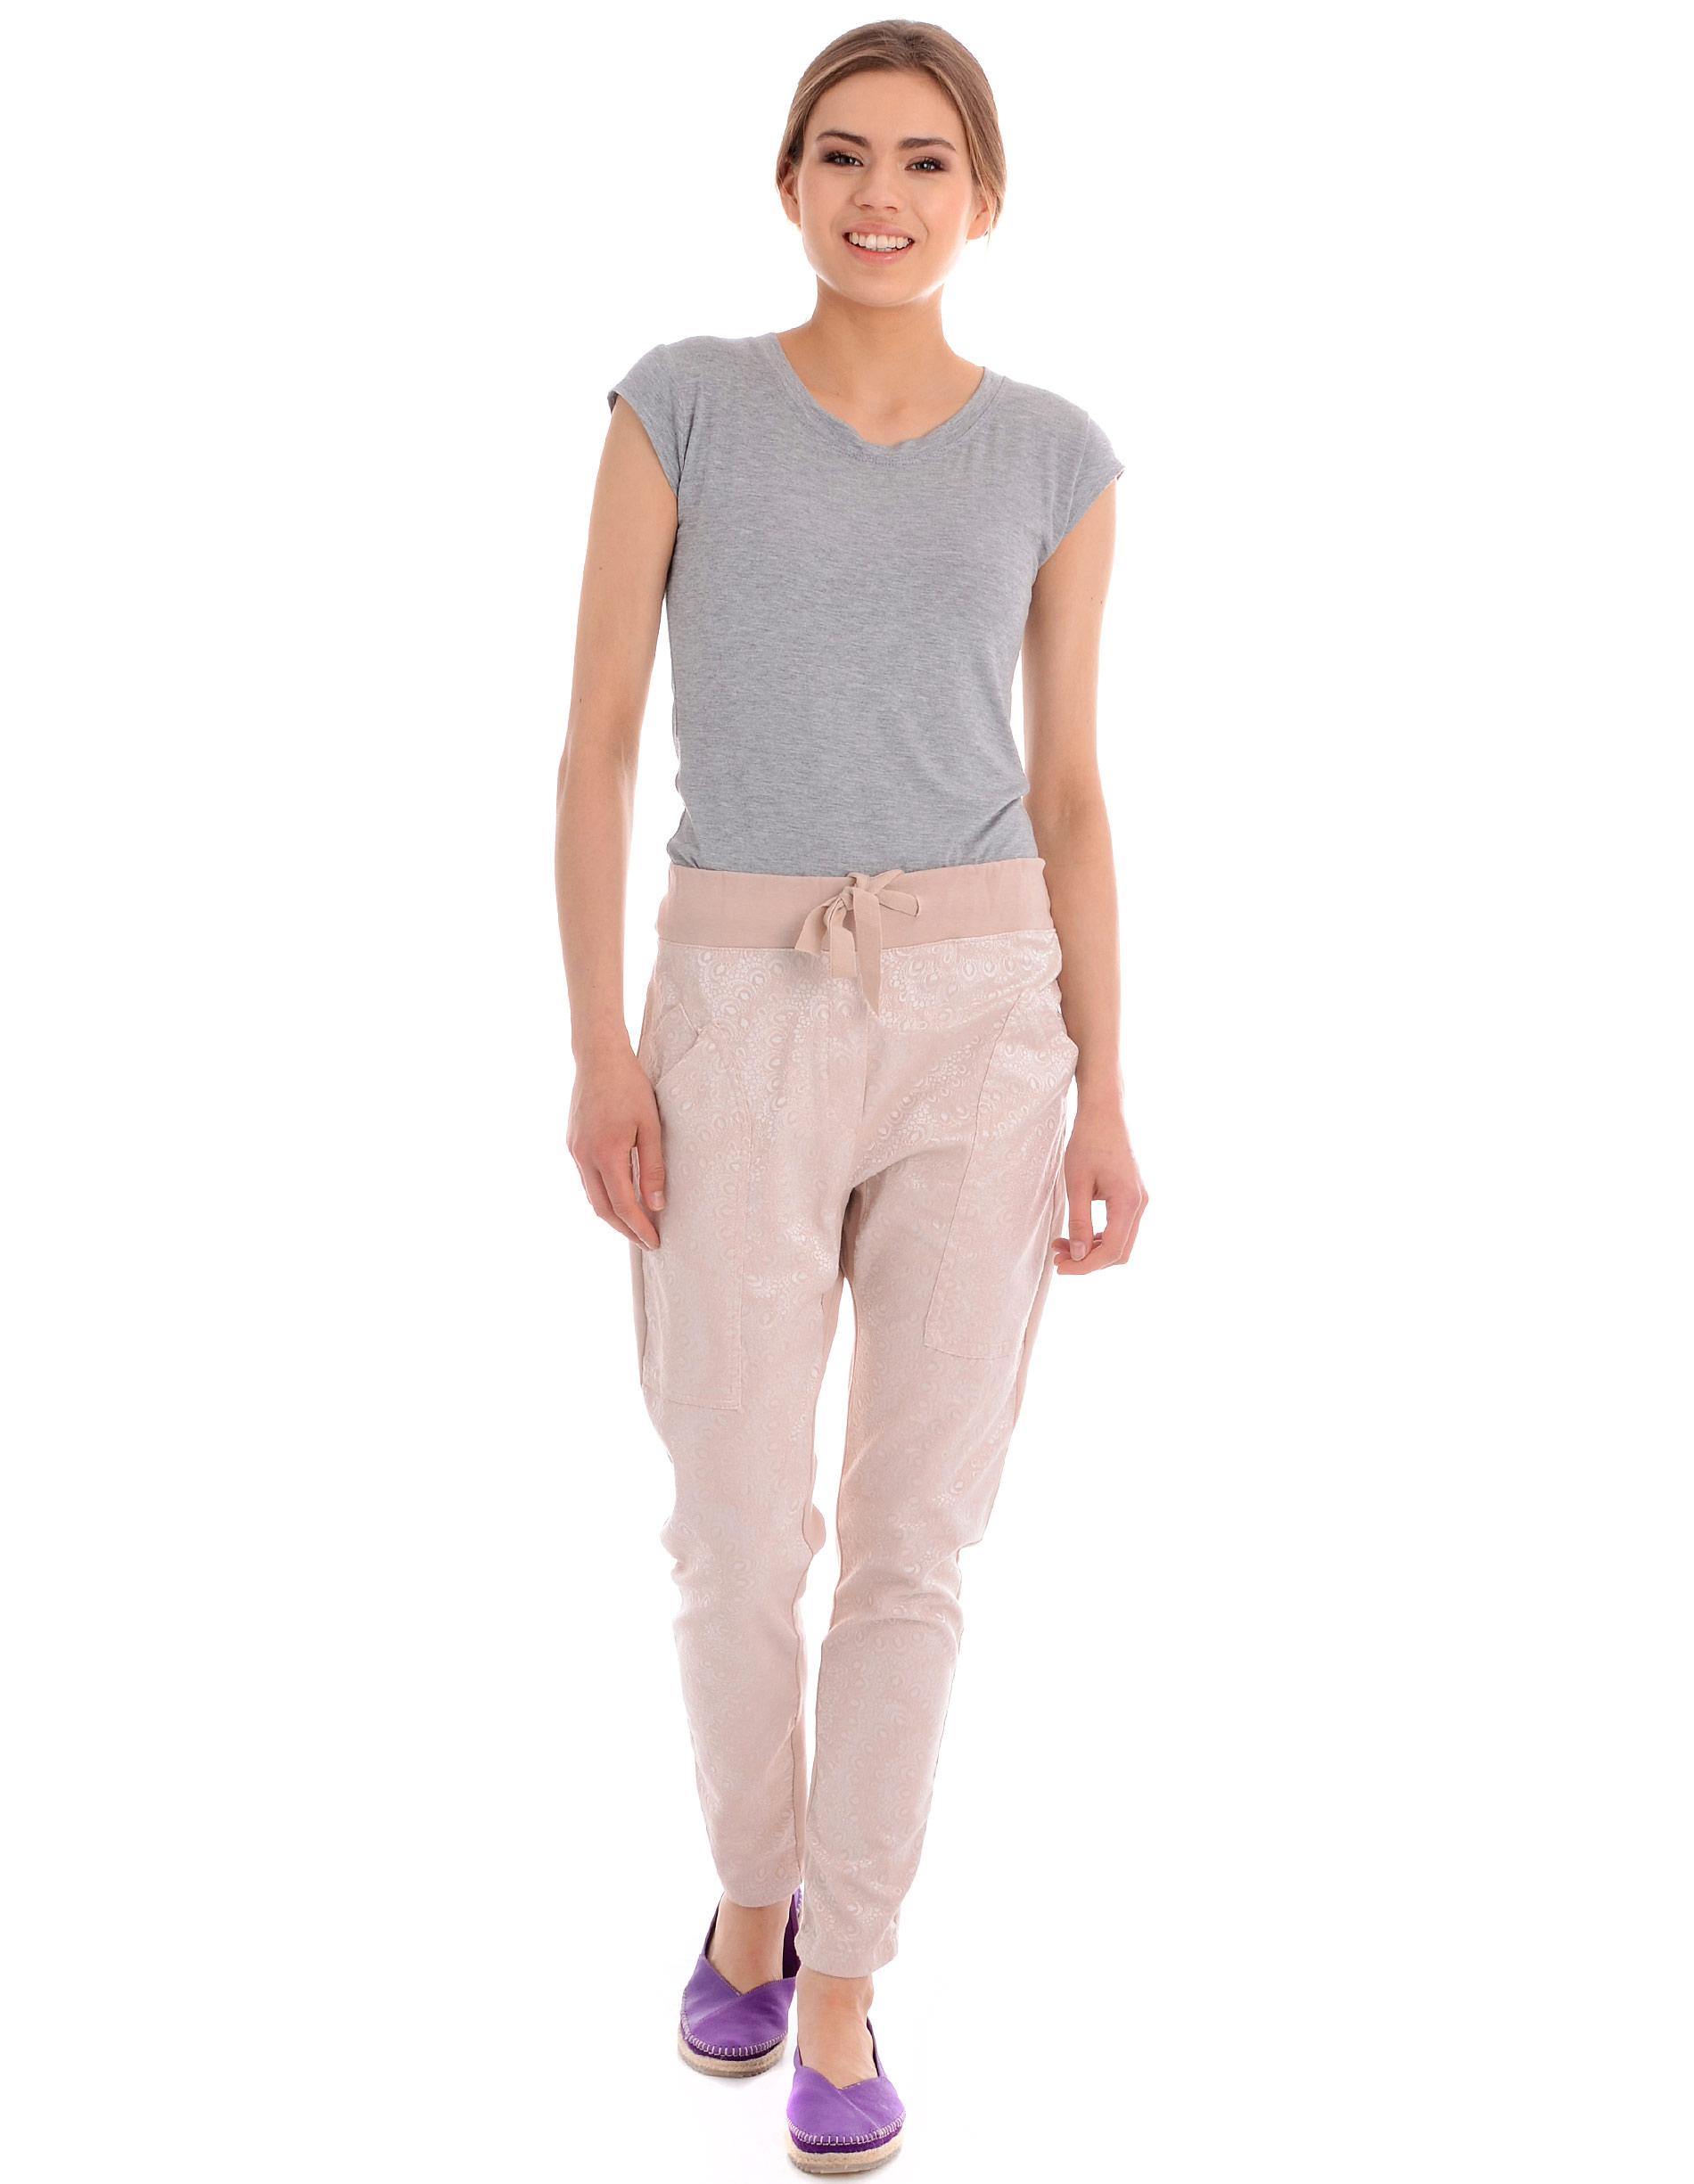 Spodnie - 104-1521 ROSA - Unisono